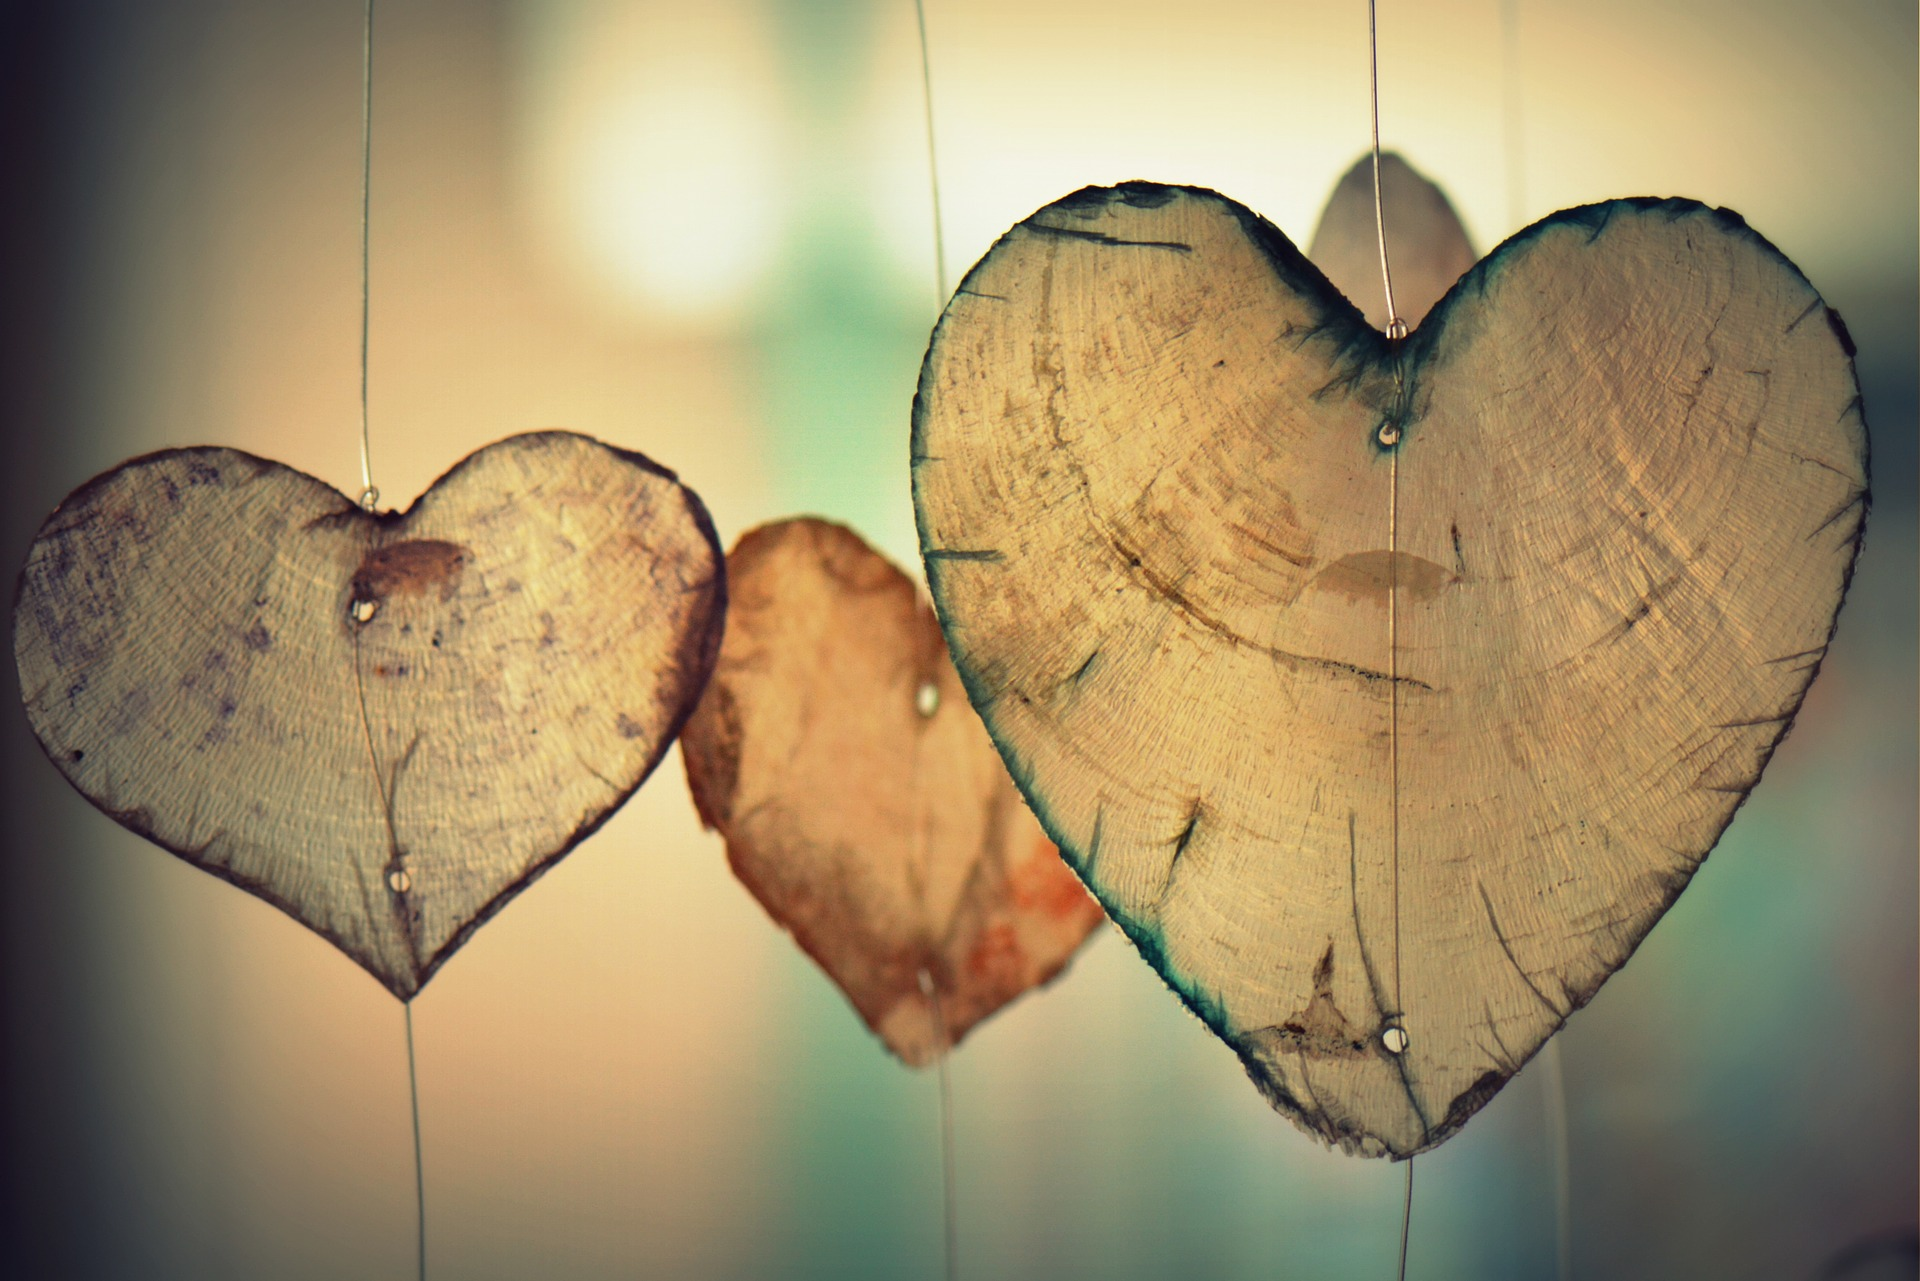 coeurs, amour, pendentifs, ornements, métiers d'art - Fonds d'écran HD - Professor-falken.com